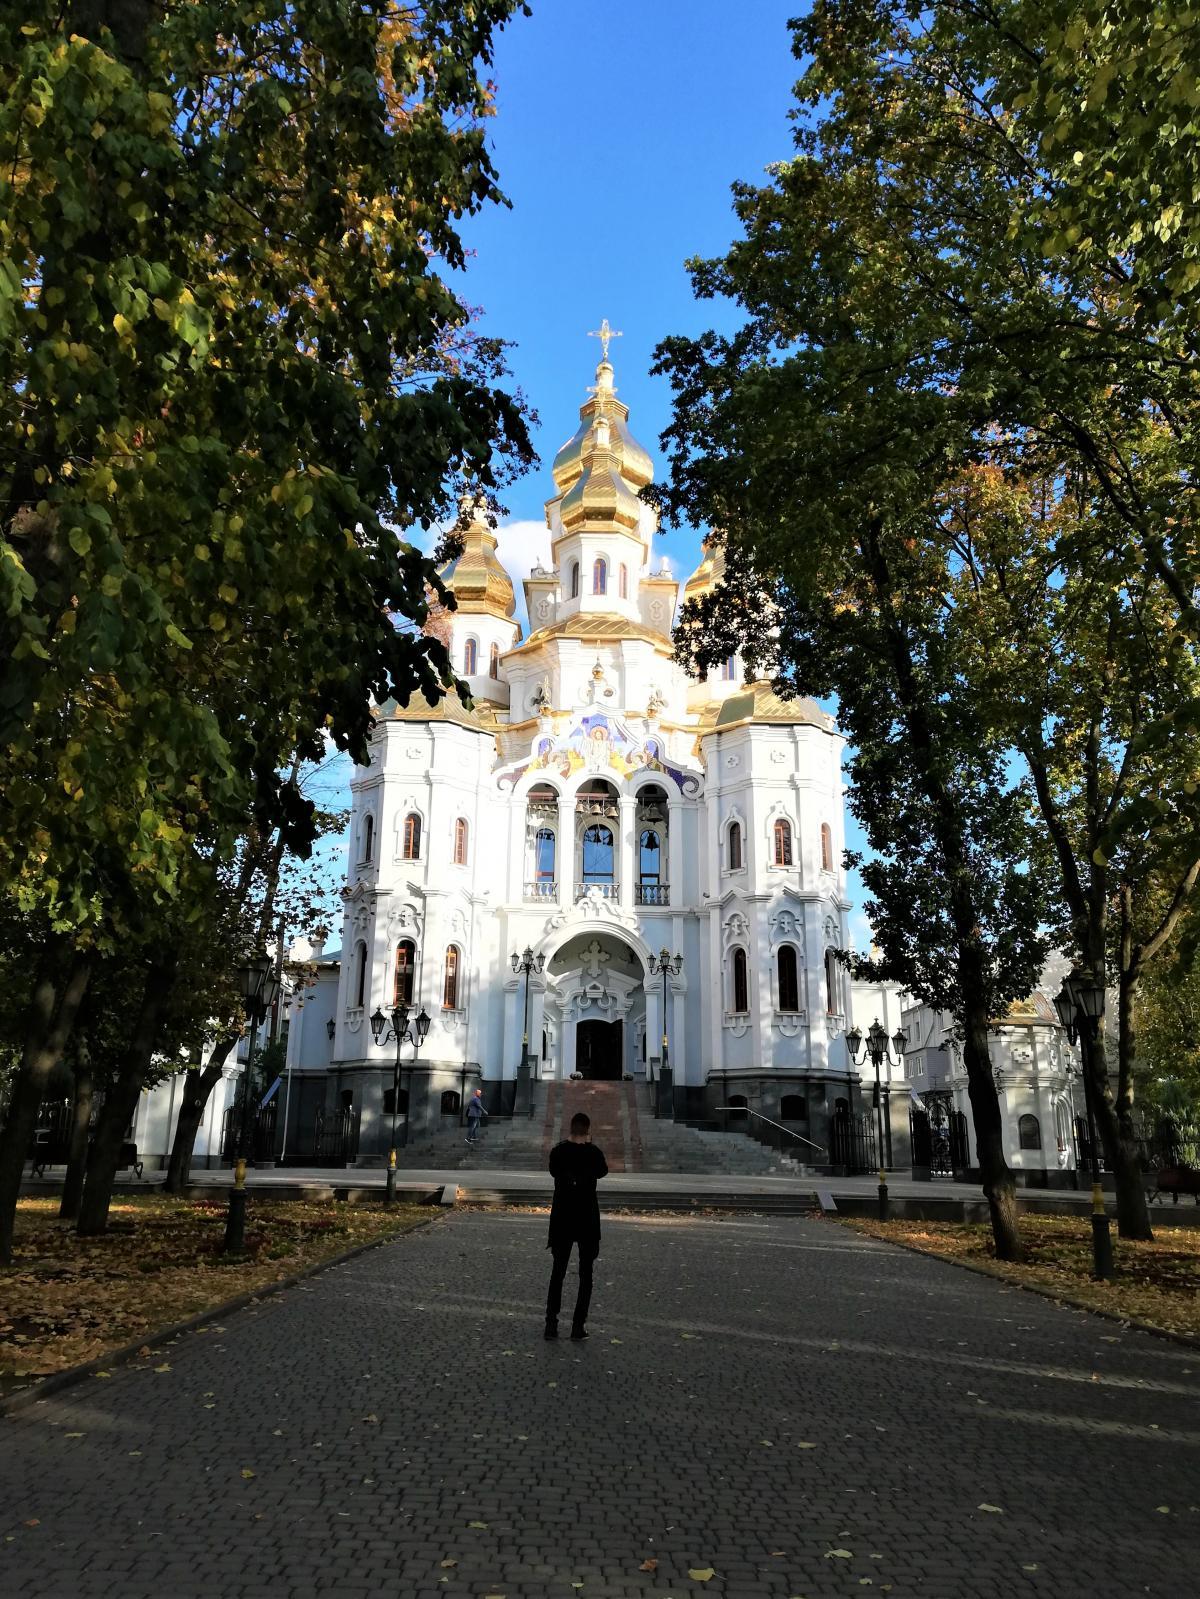 Сквер перед Храмом Святих Дружин-Мироносиць у Харкові / фото Марина Григоренко